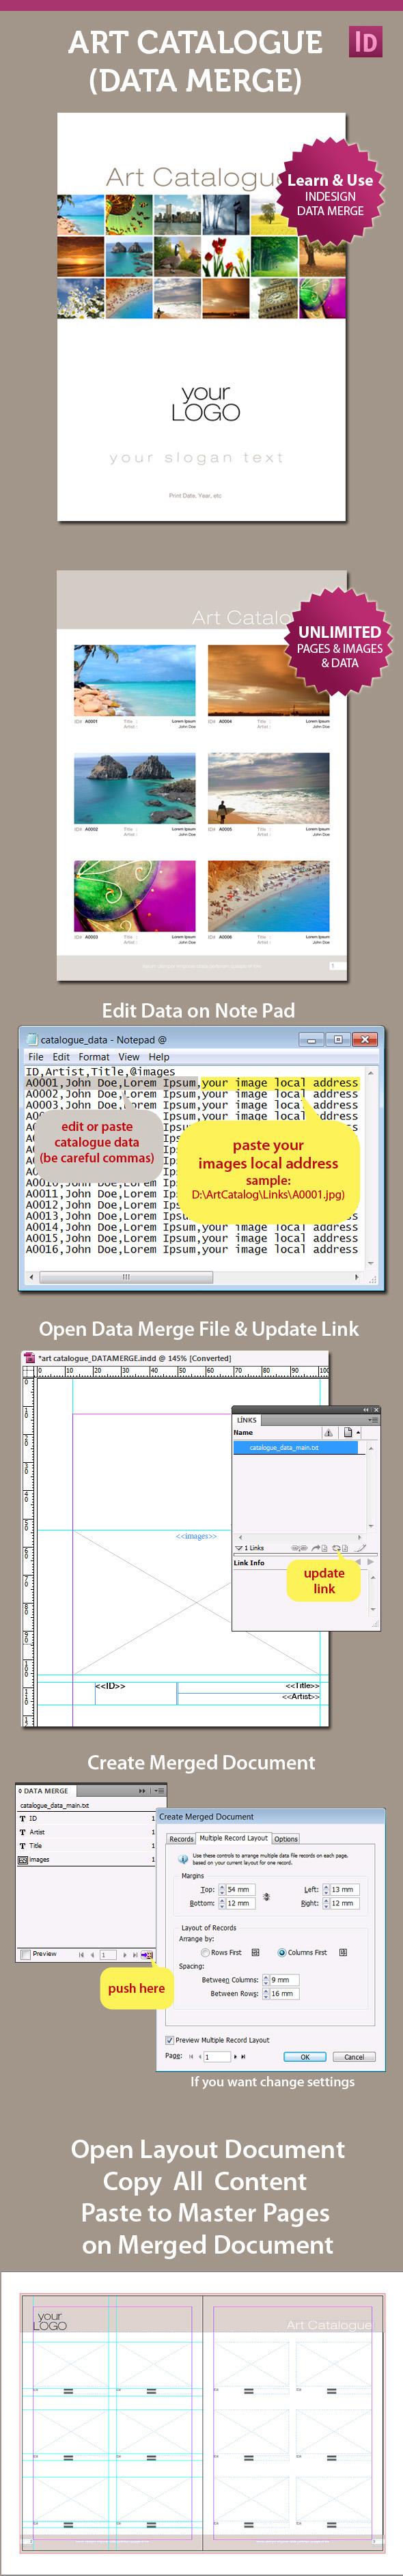 Indesign data merge images